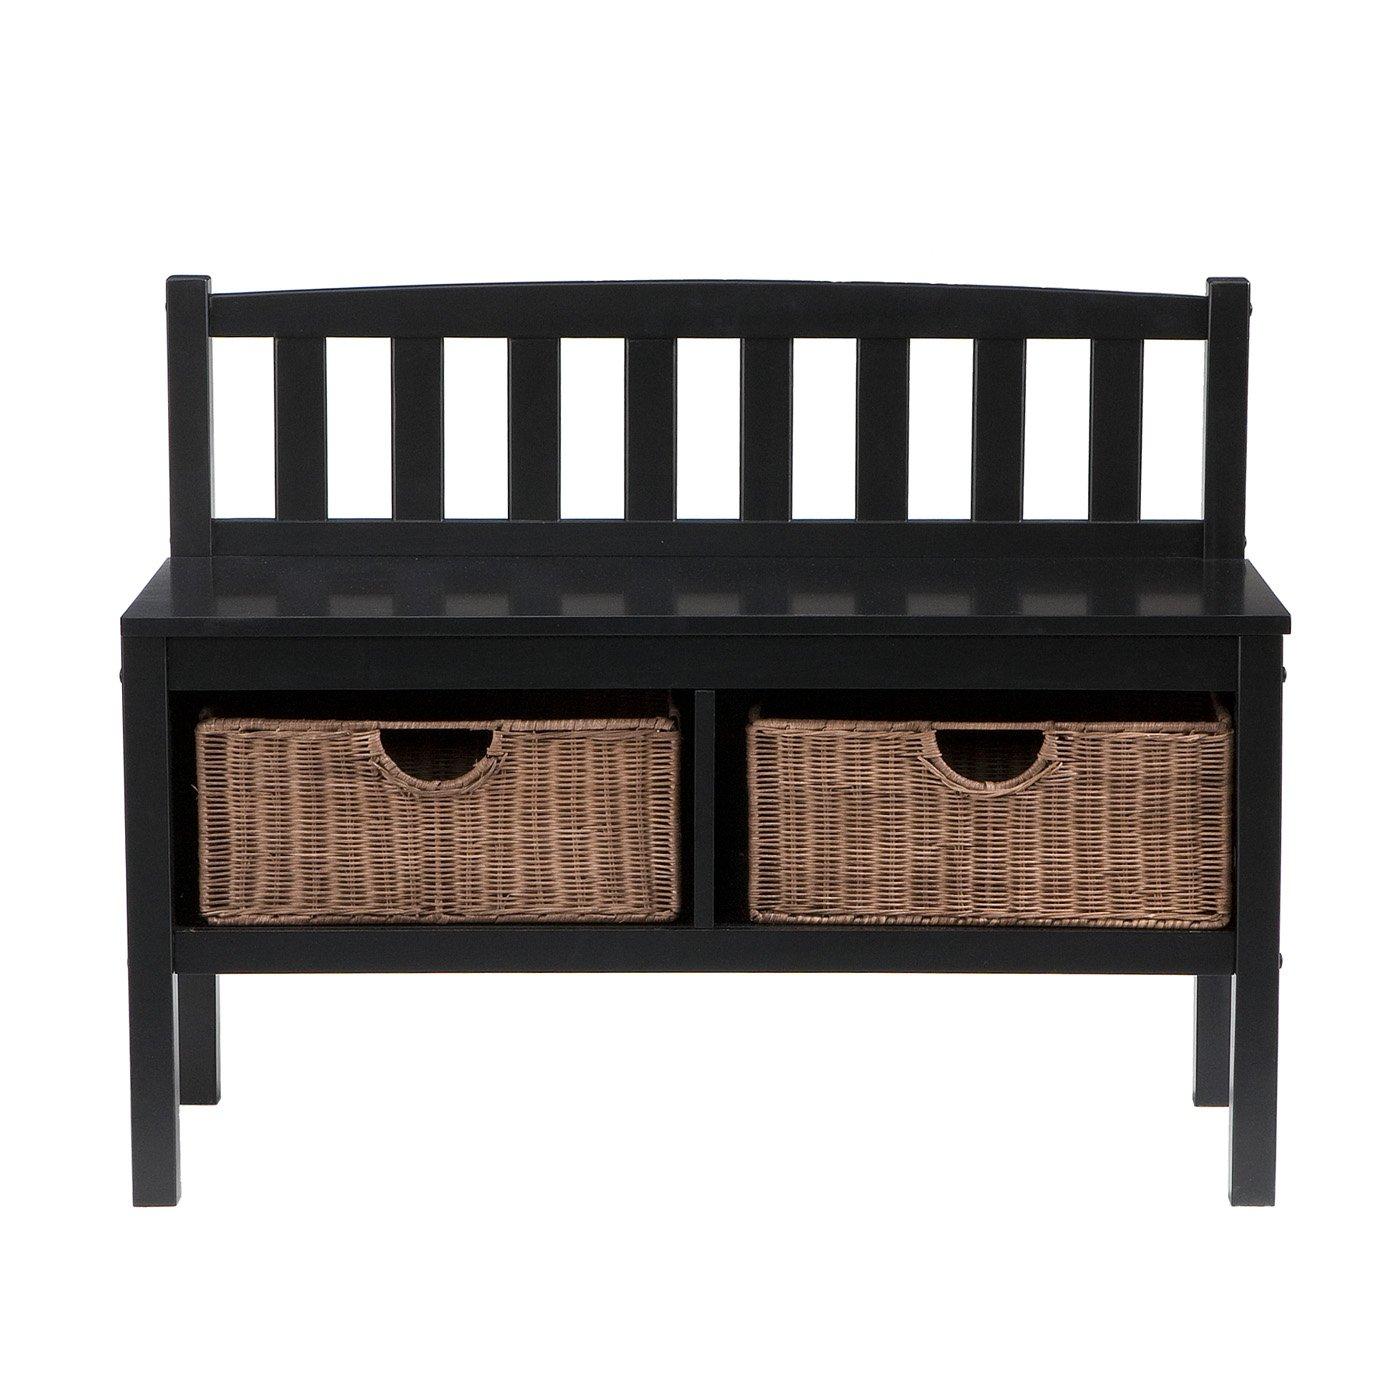 Delightful Amazon.com: Southern Enterprises Storage Bench With Rattan Baskets, Black  Finish: Kitchen U0026 Dining